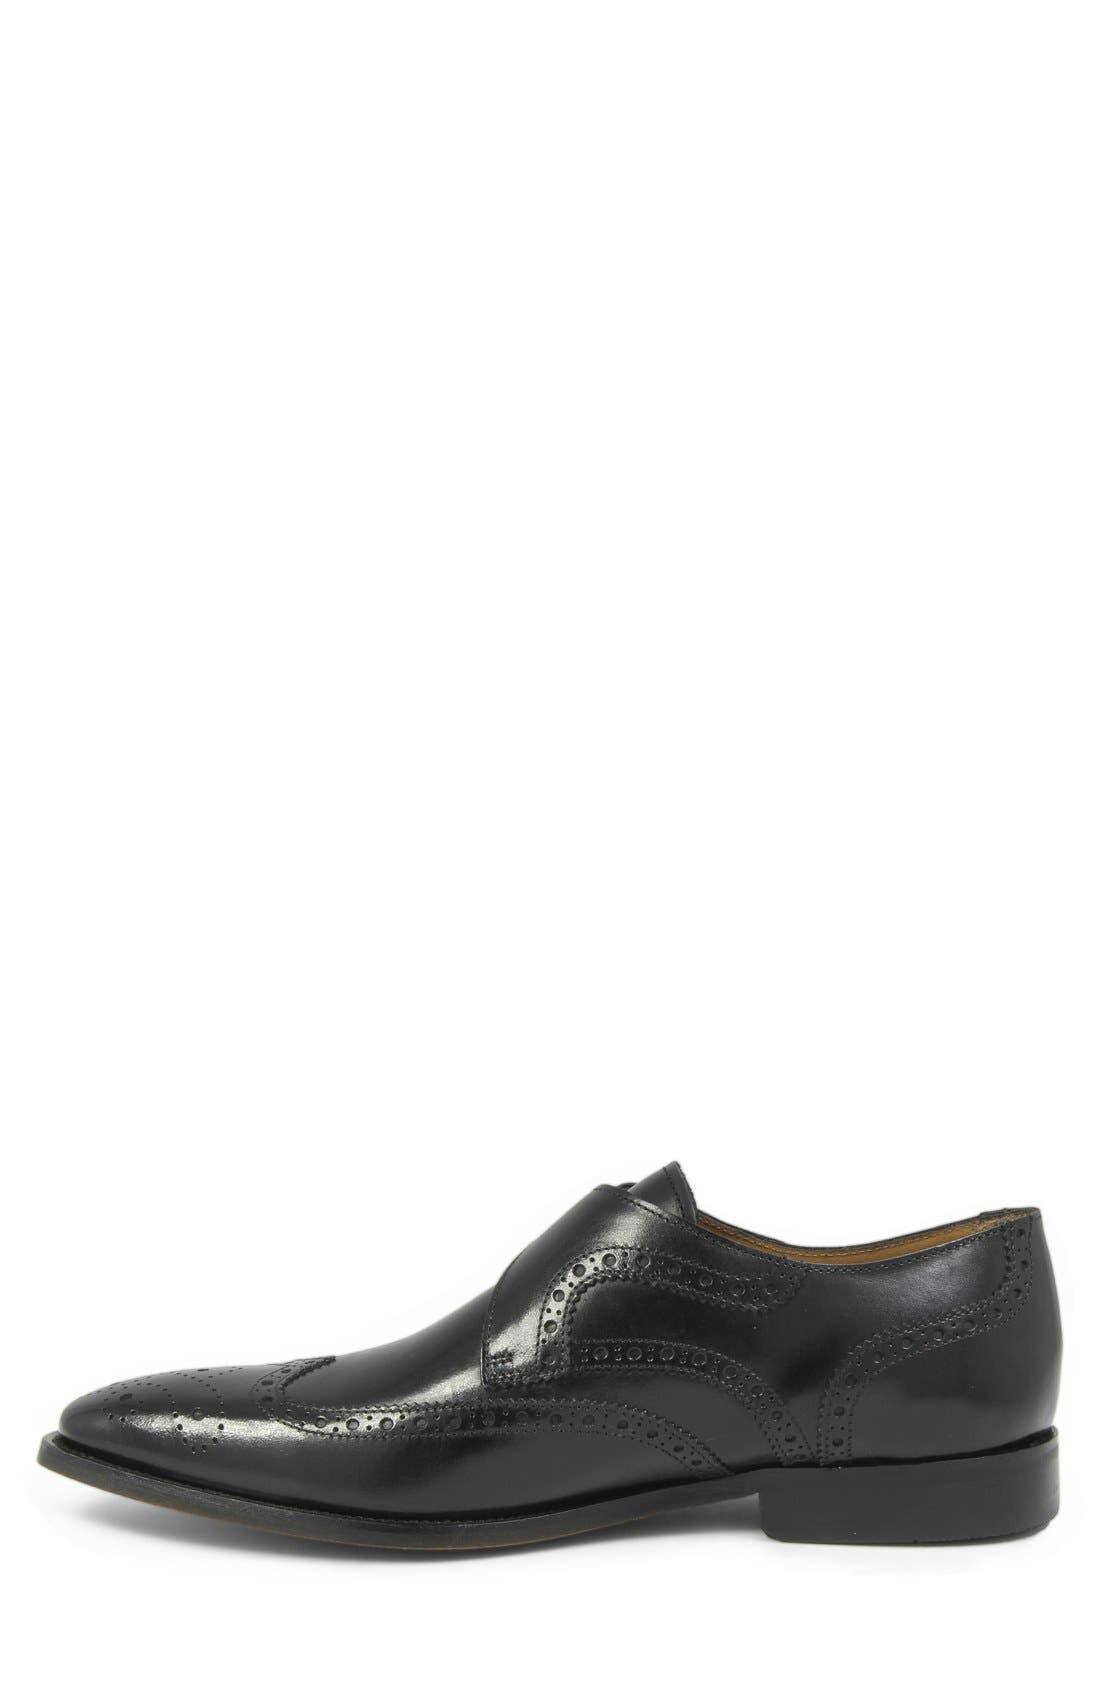 'Sabato' Wingtip Monk Strap Shoe,                             Alternate thumbnail 2, color,                             Black